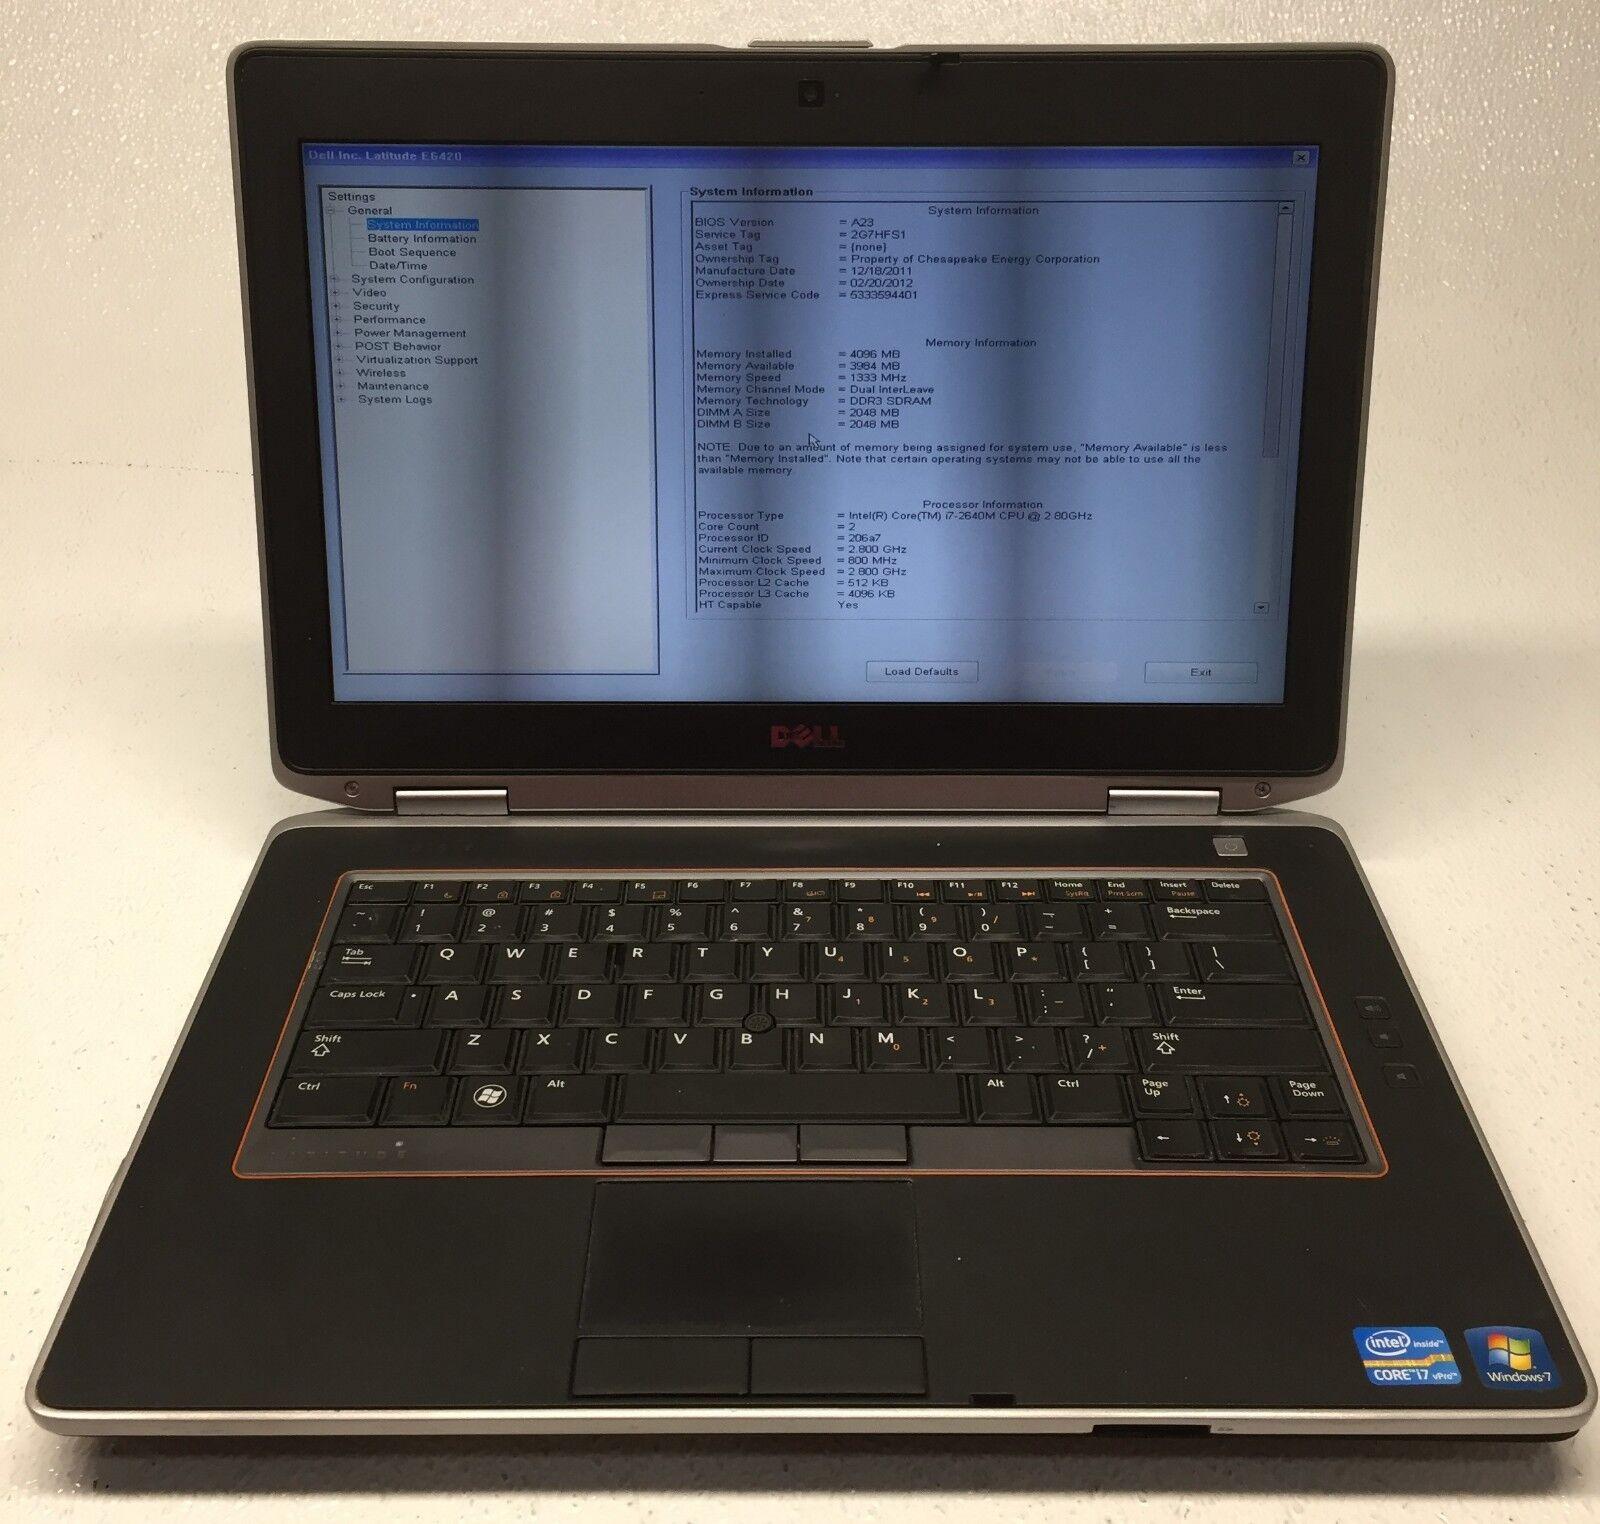 "Dell Latitude E6420 14"" i7-2640M 2.80GHz 4GB RAM NO HDD *BOOTS TO BIOS*"